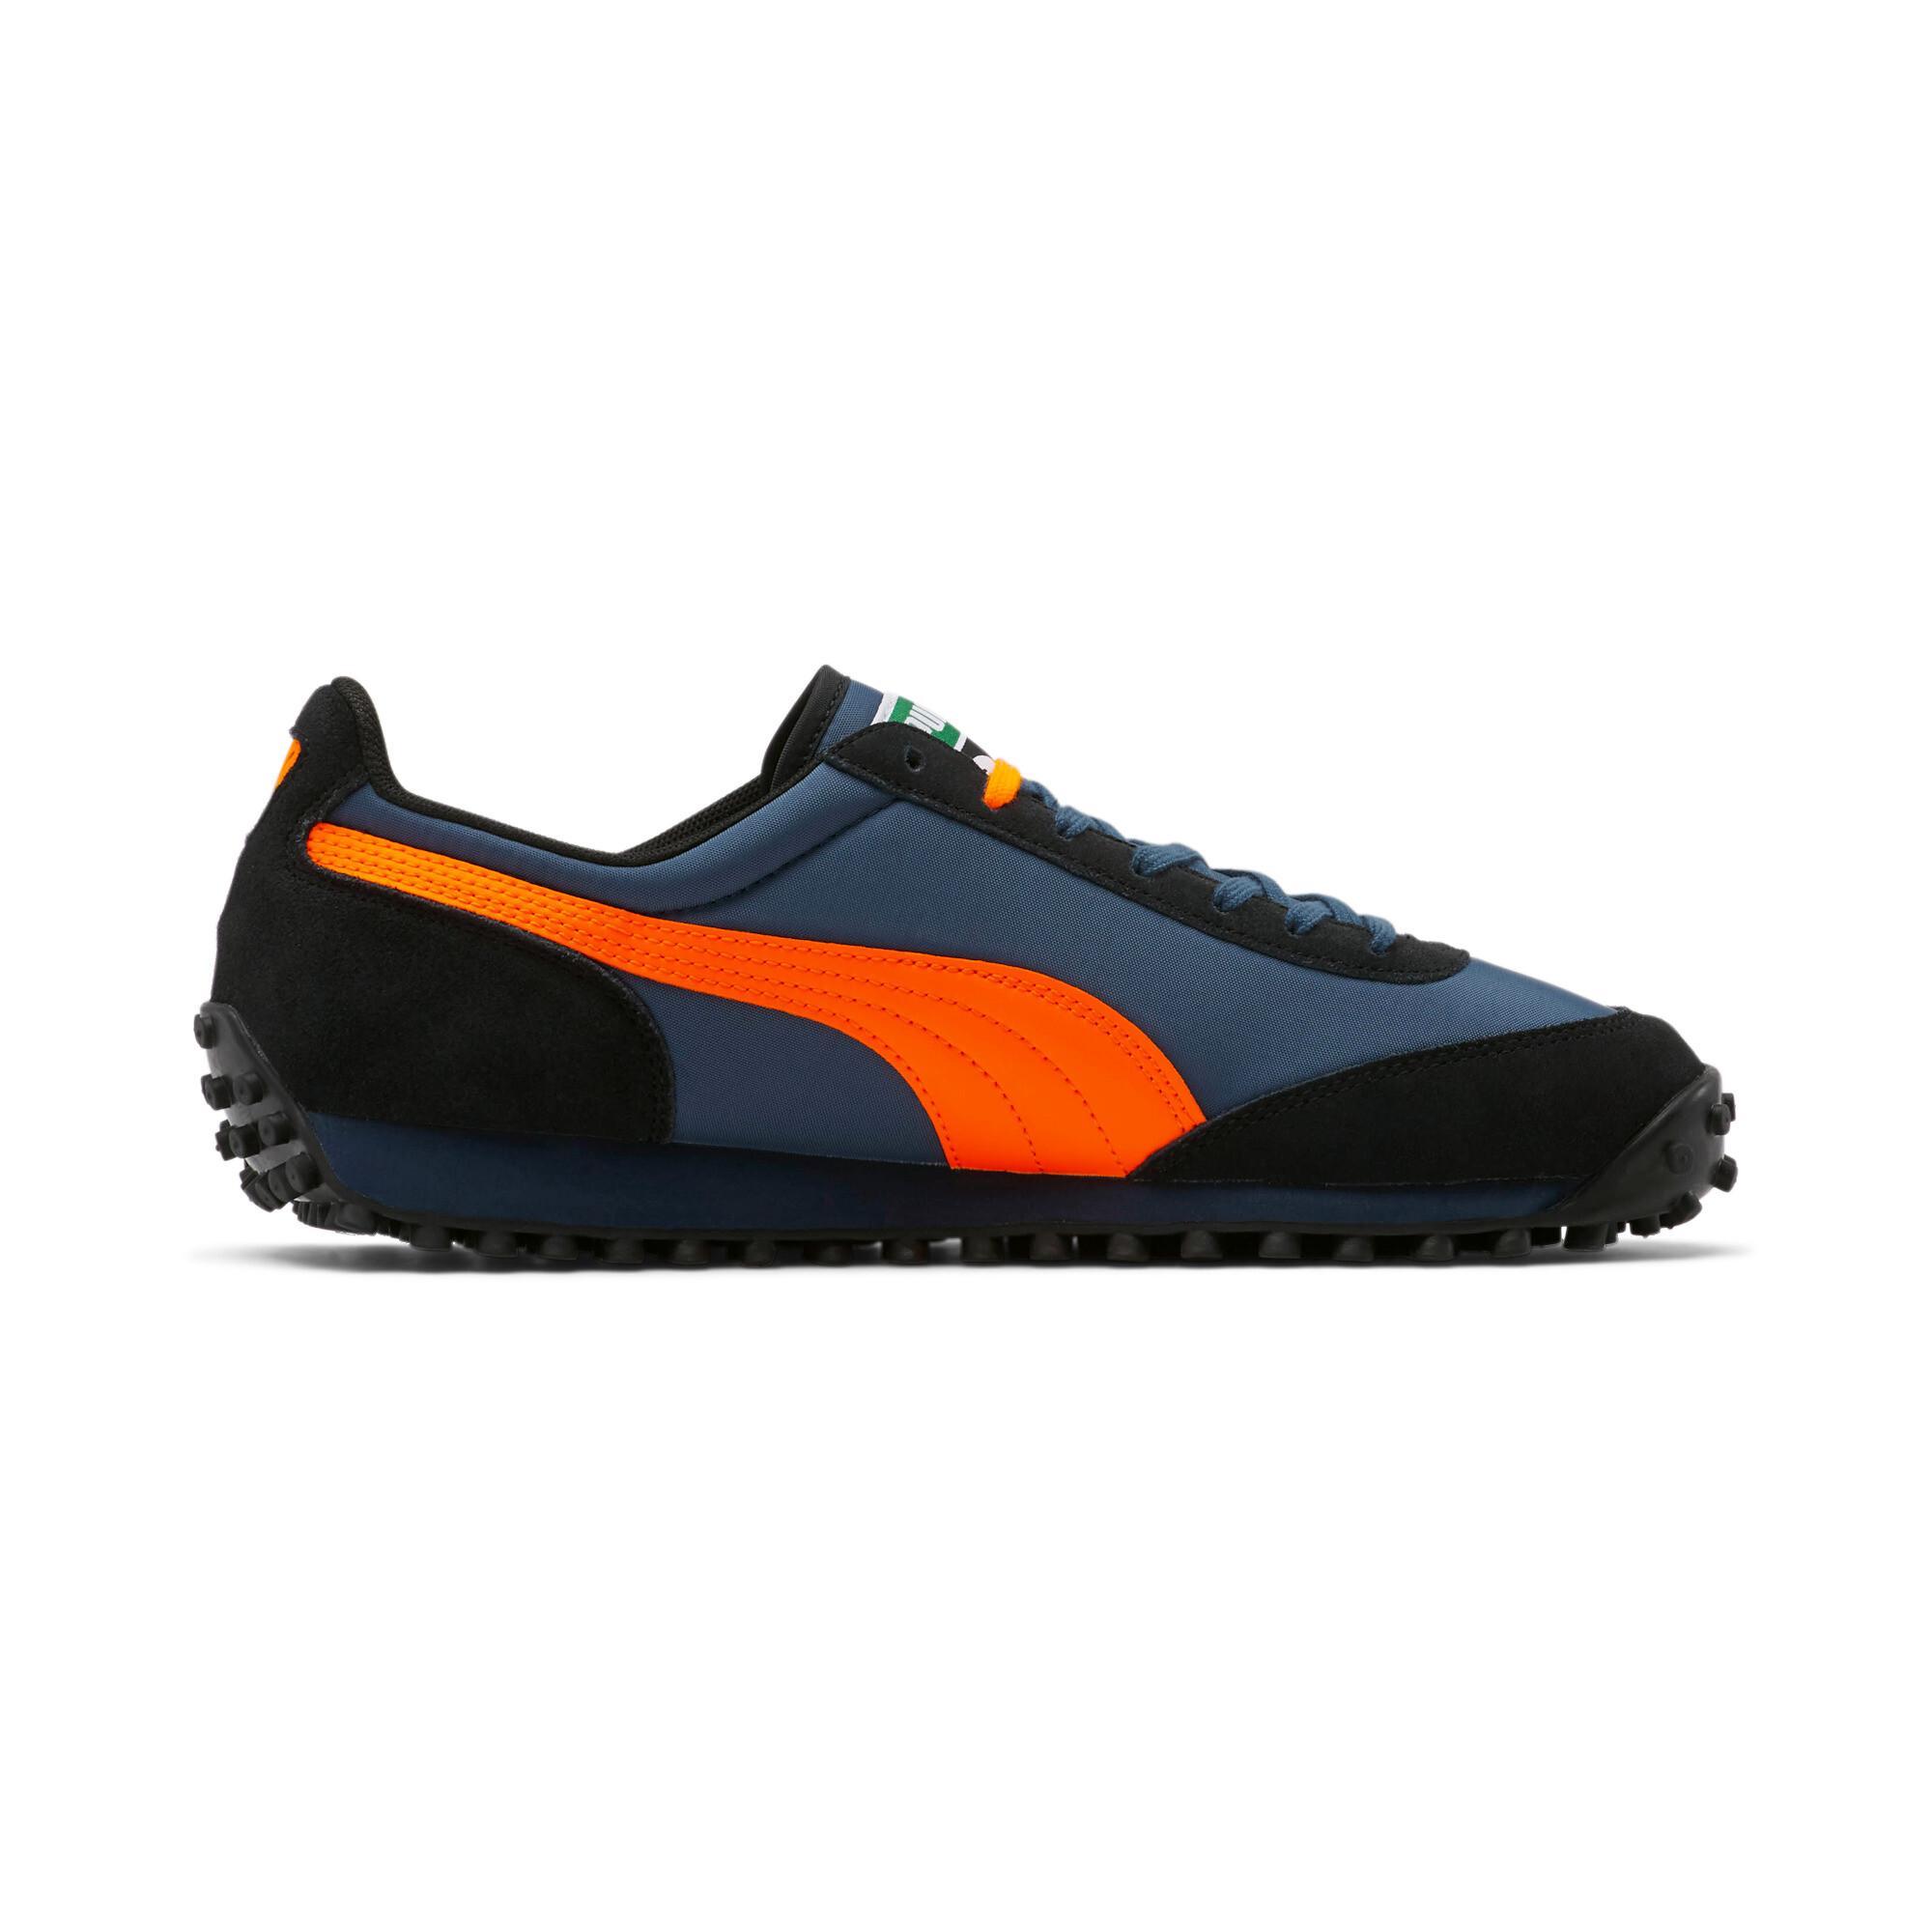 PUMA-Men-039-s-Fast-Rider-Source-Sneakers thumbnail 20